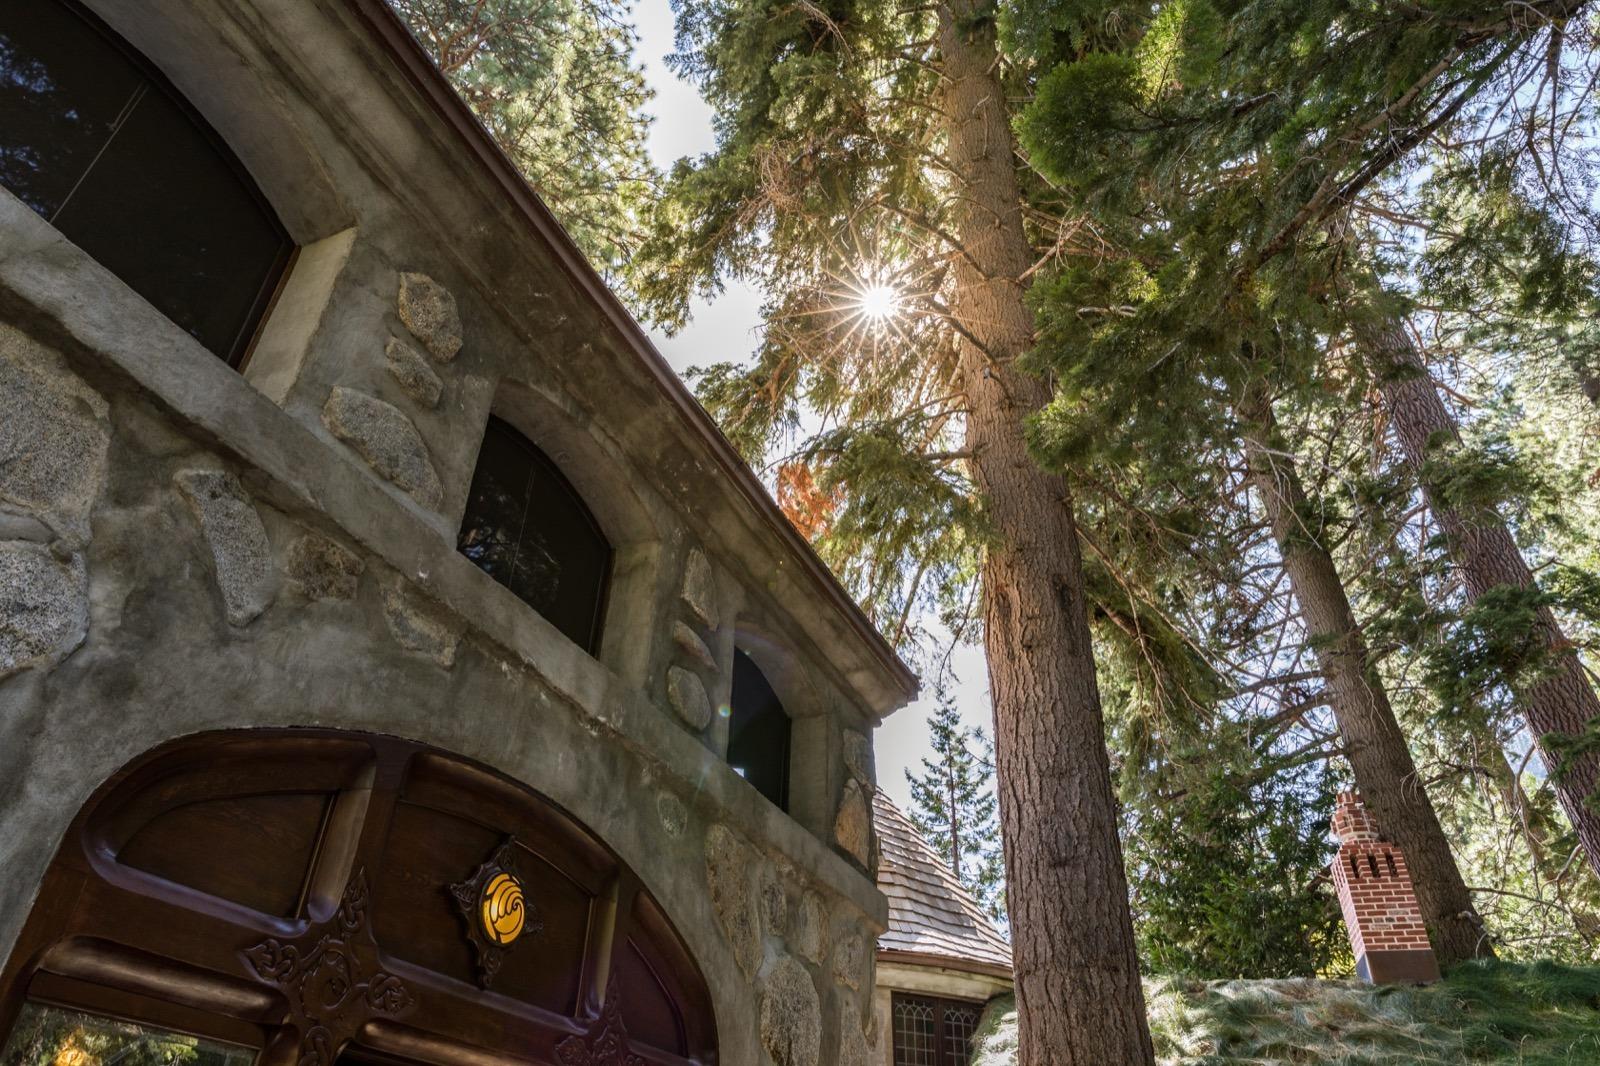 california-high-sierra-south-lake-tahoe-emerald-bay-vikingsholm-2